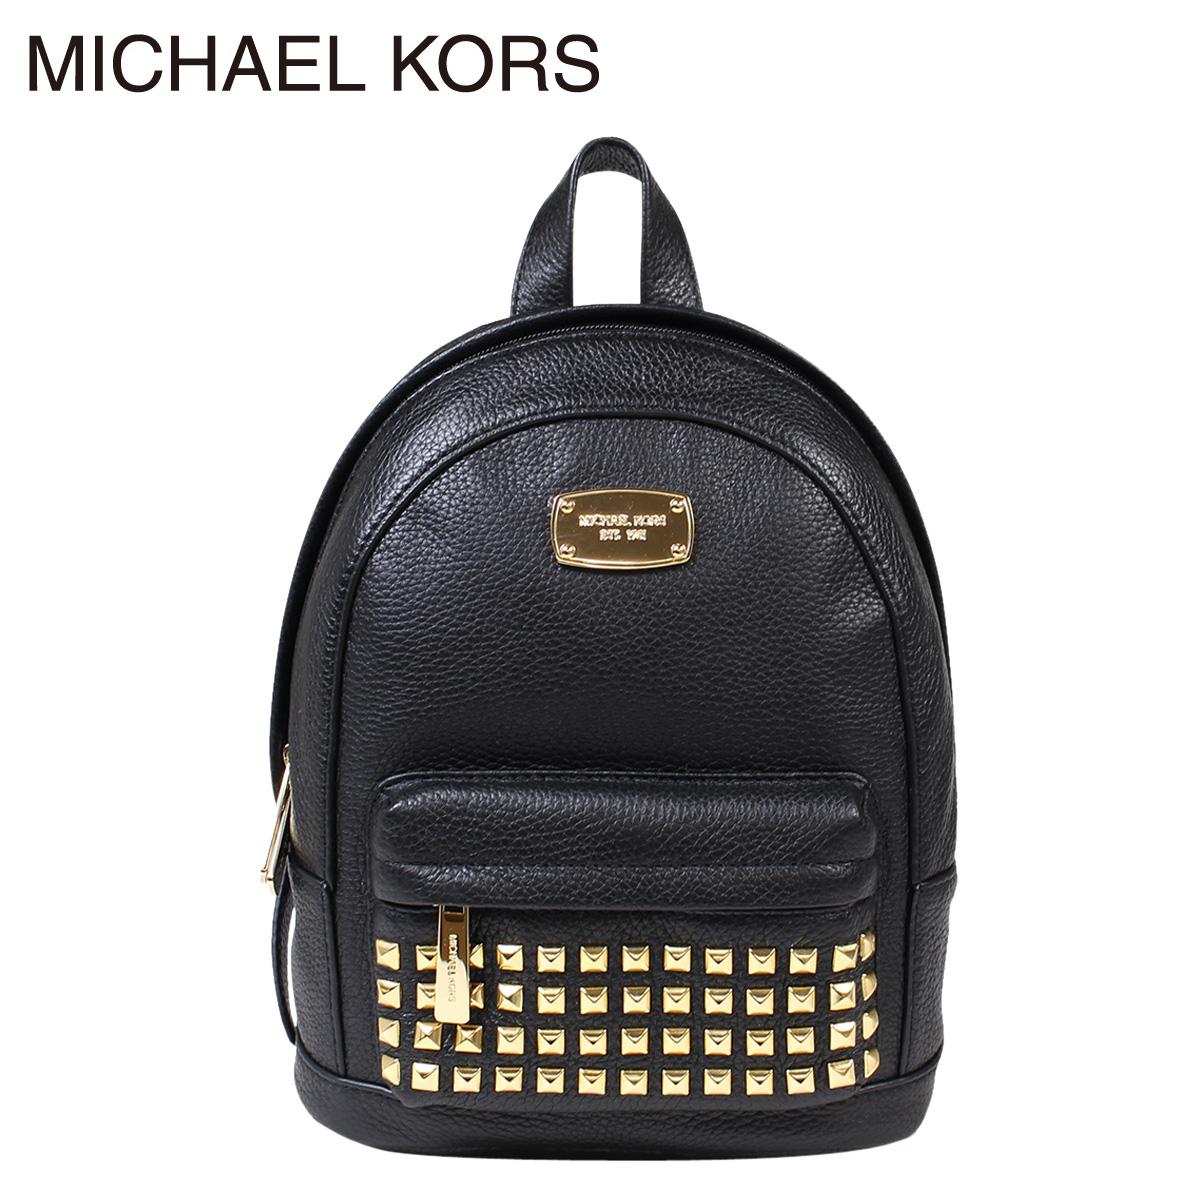 ALLSPORTS  Michael Kors bag rucksack MICHAEL KORS backpack ... 71bc996d12035